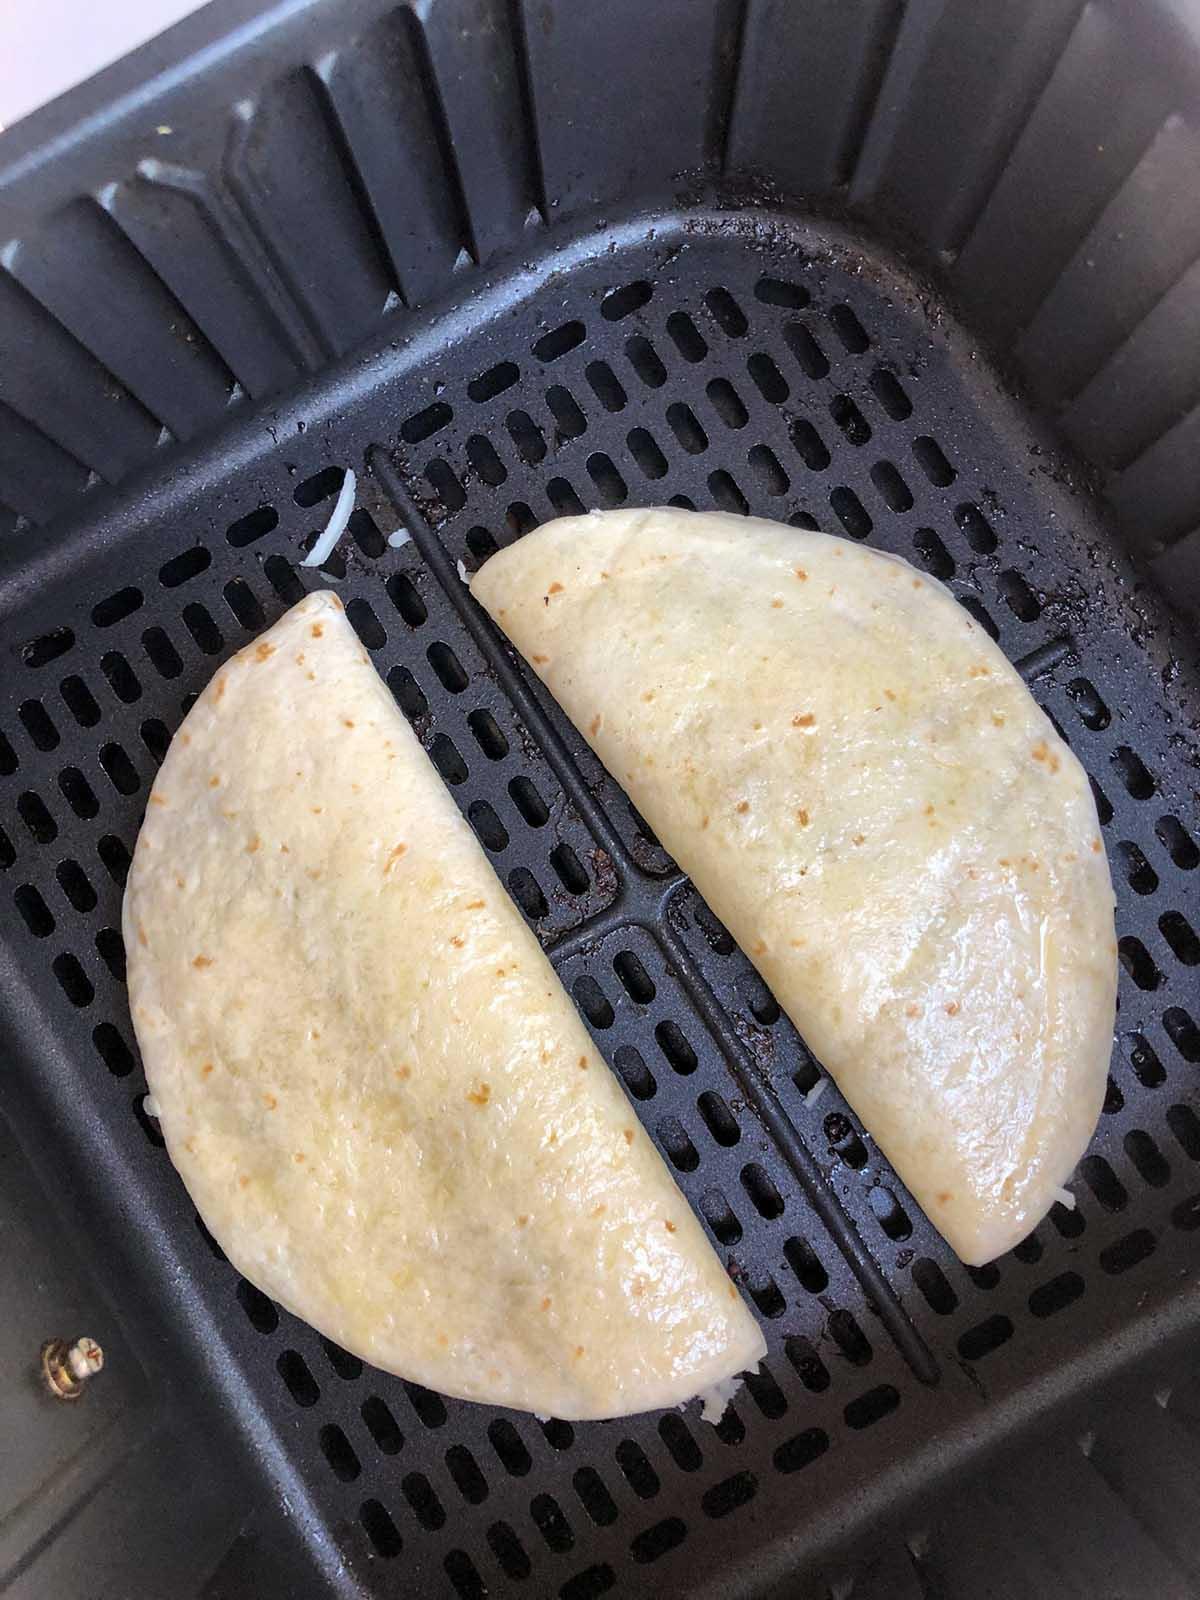 uncooked quesadilla in air fryer basket